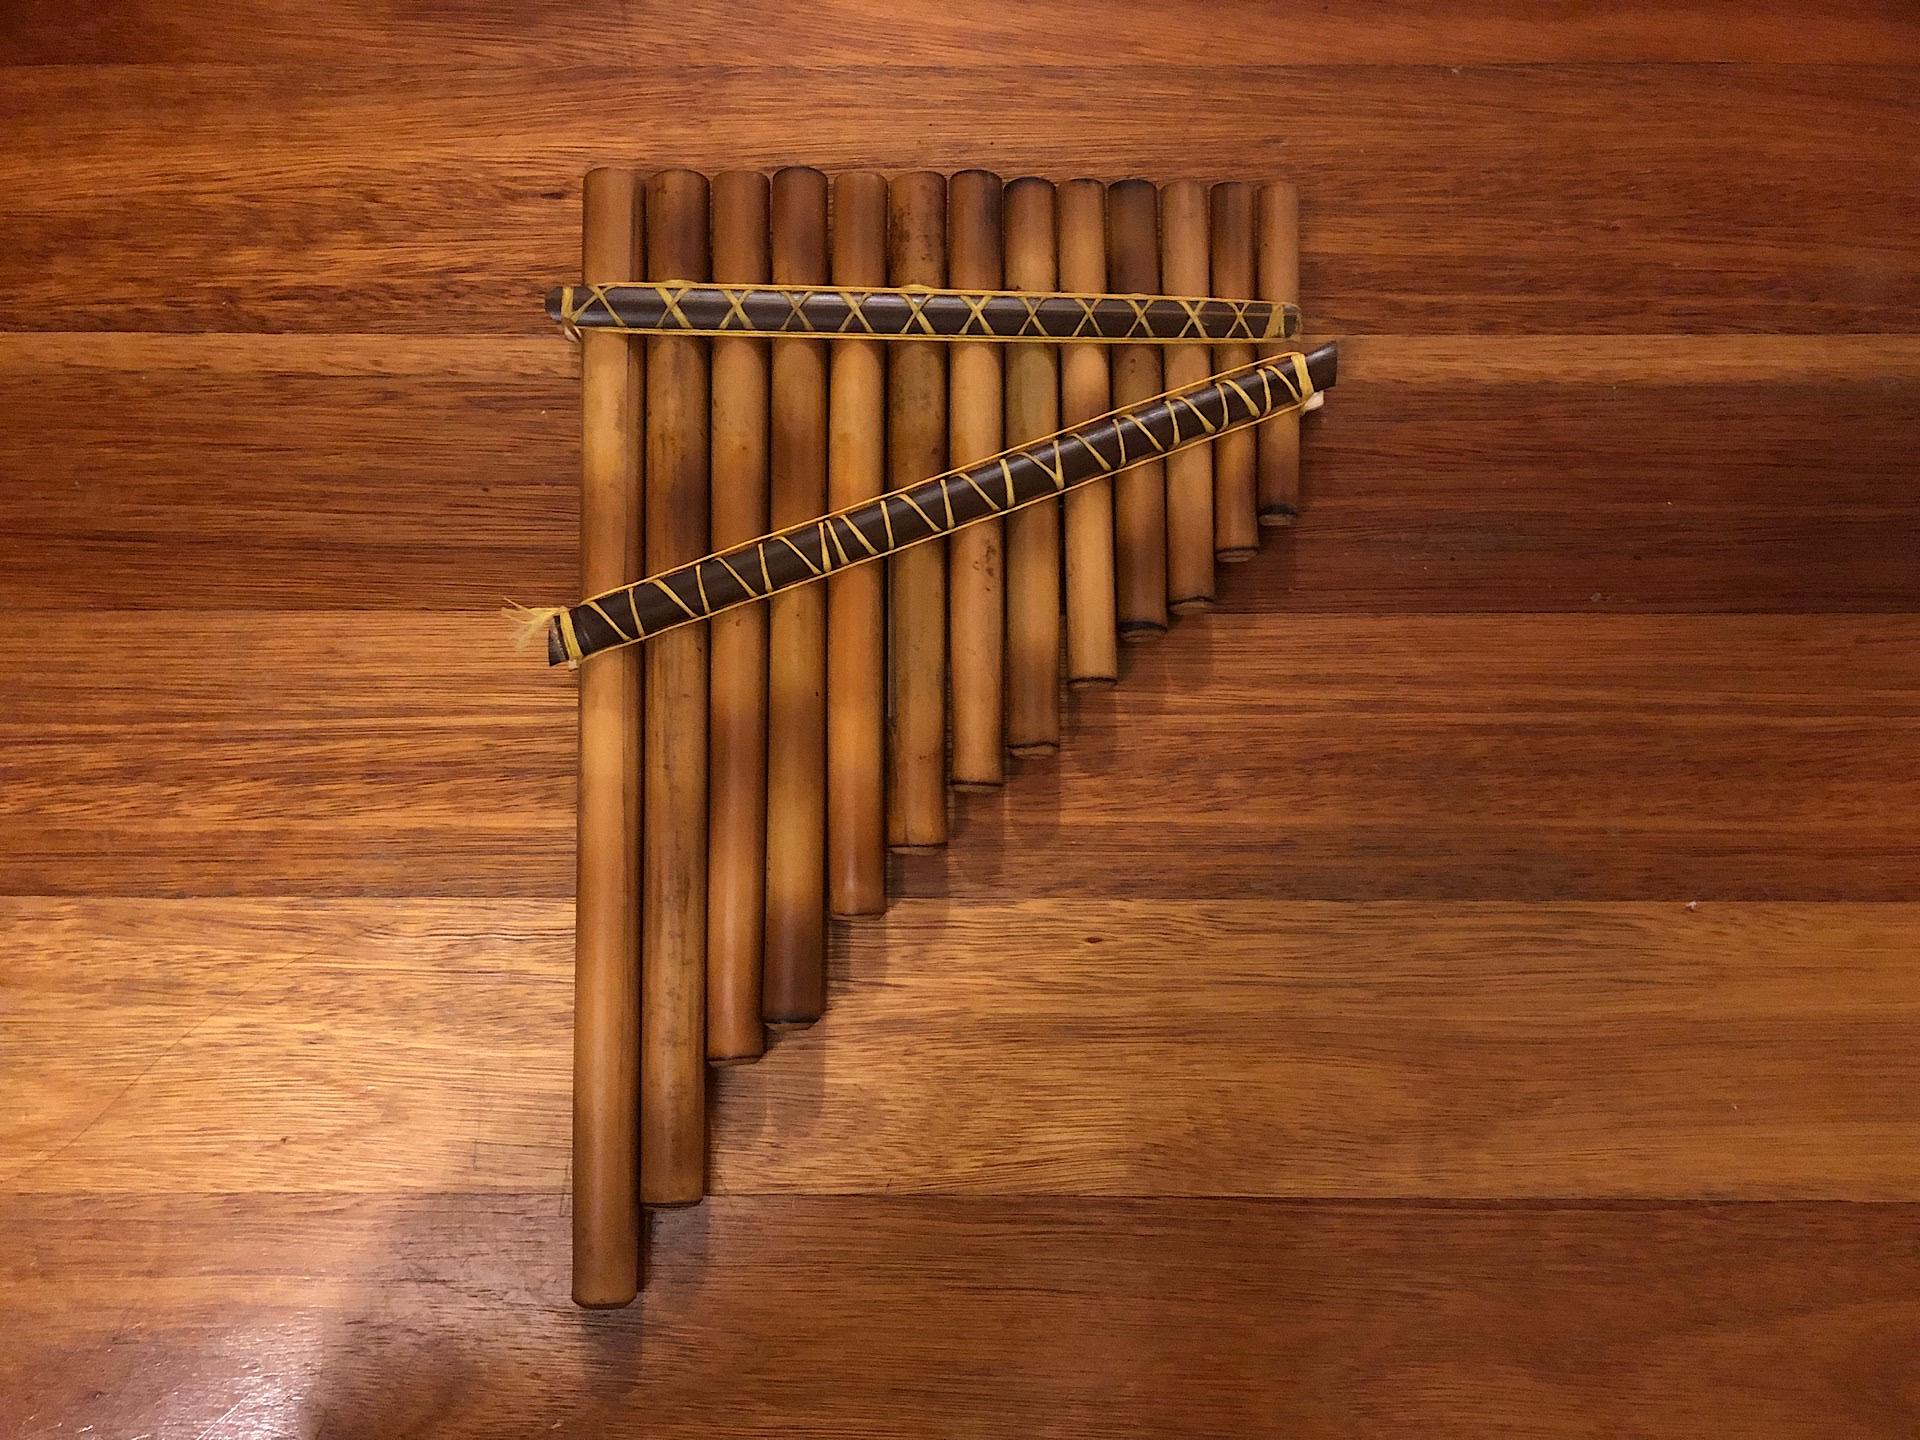 Antara pan flute